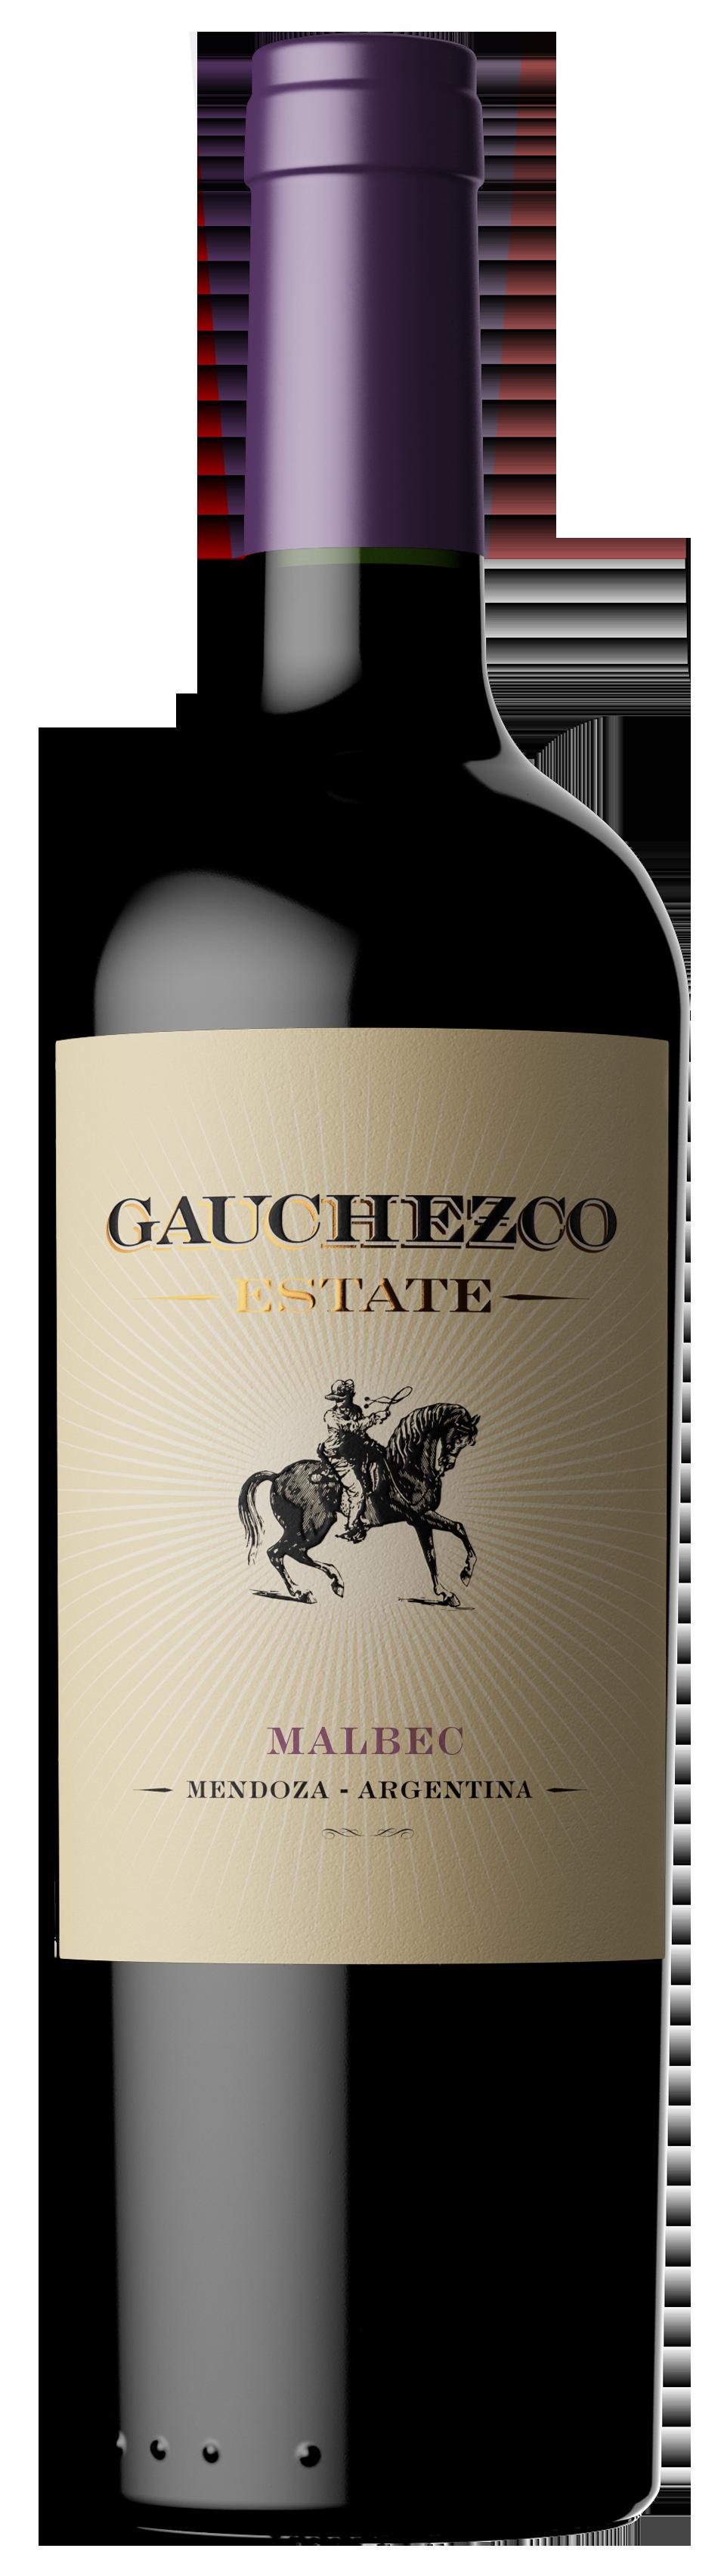 Gauchezco Estate Malbec 2017